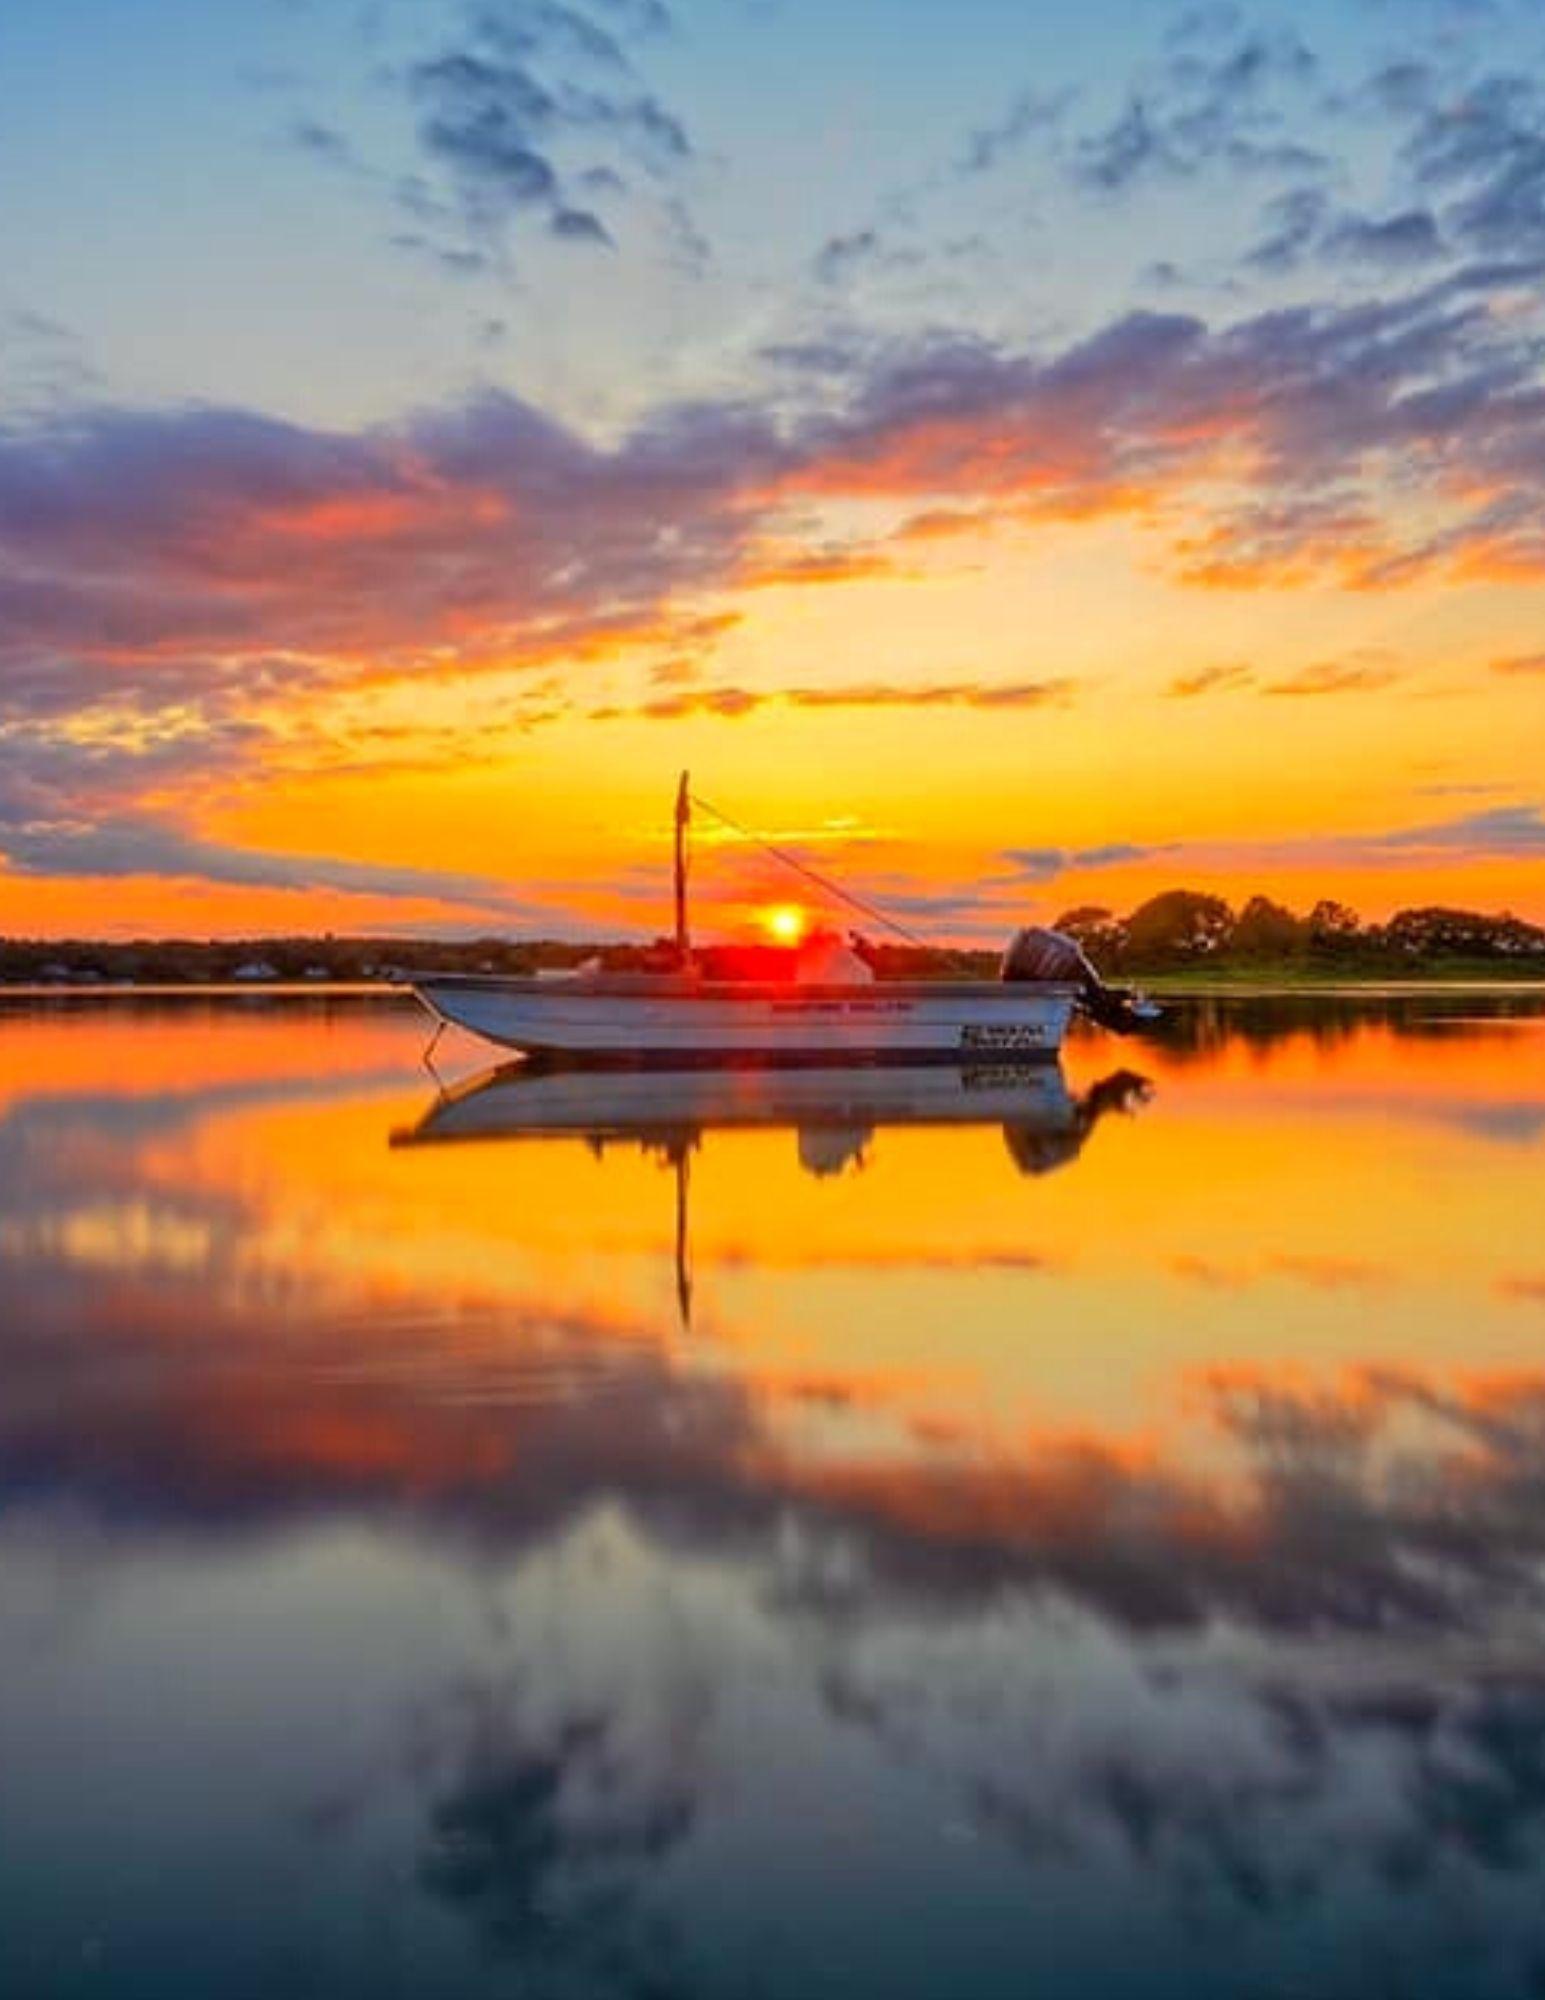 John Montes Jr Photography Best Places to Photograph Sunrise and Sunset on Marthas Vineyard-Best Places to Photograph Sunrise and Sunset on Marthas Vineyard-27